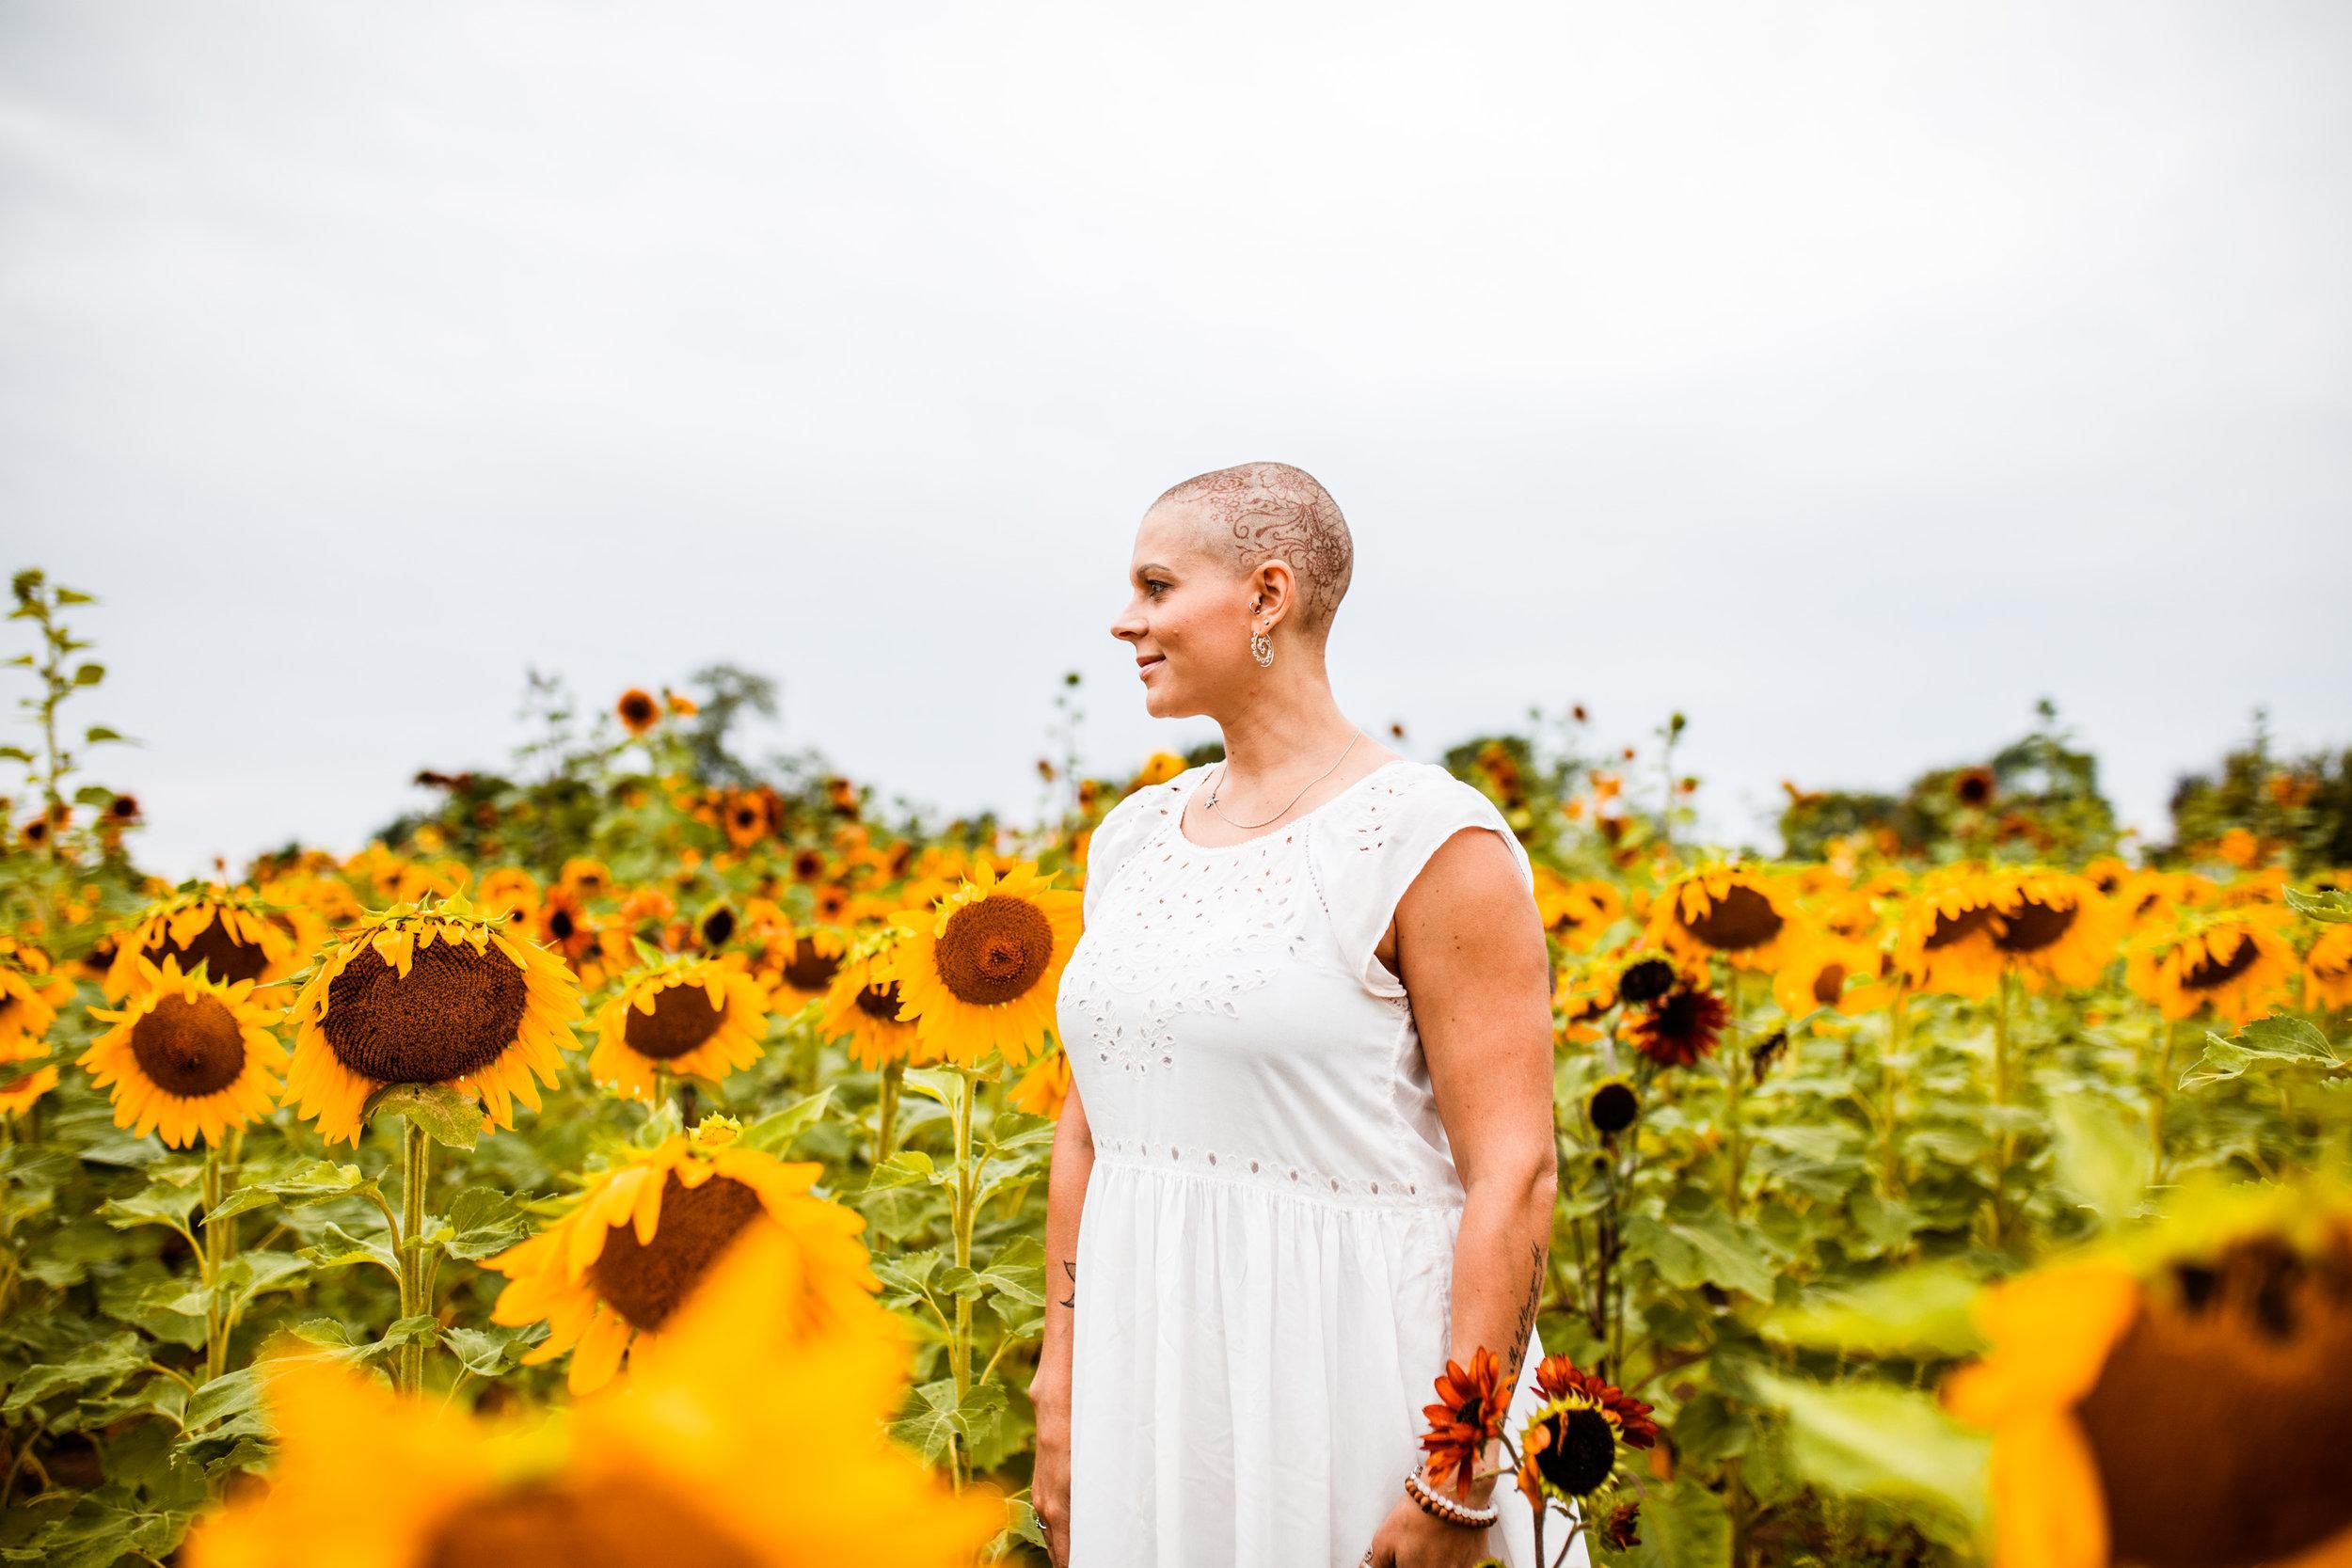 Steph_Sunflowers-30.jpg